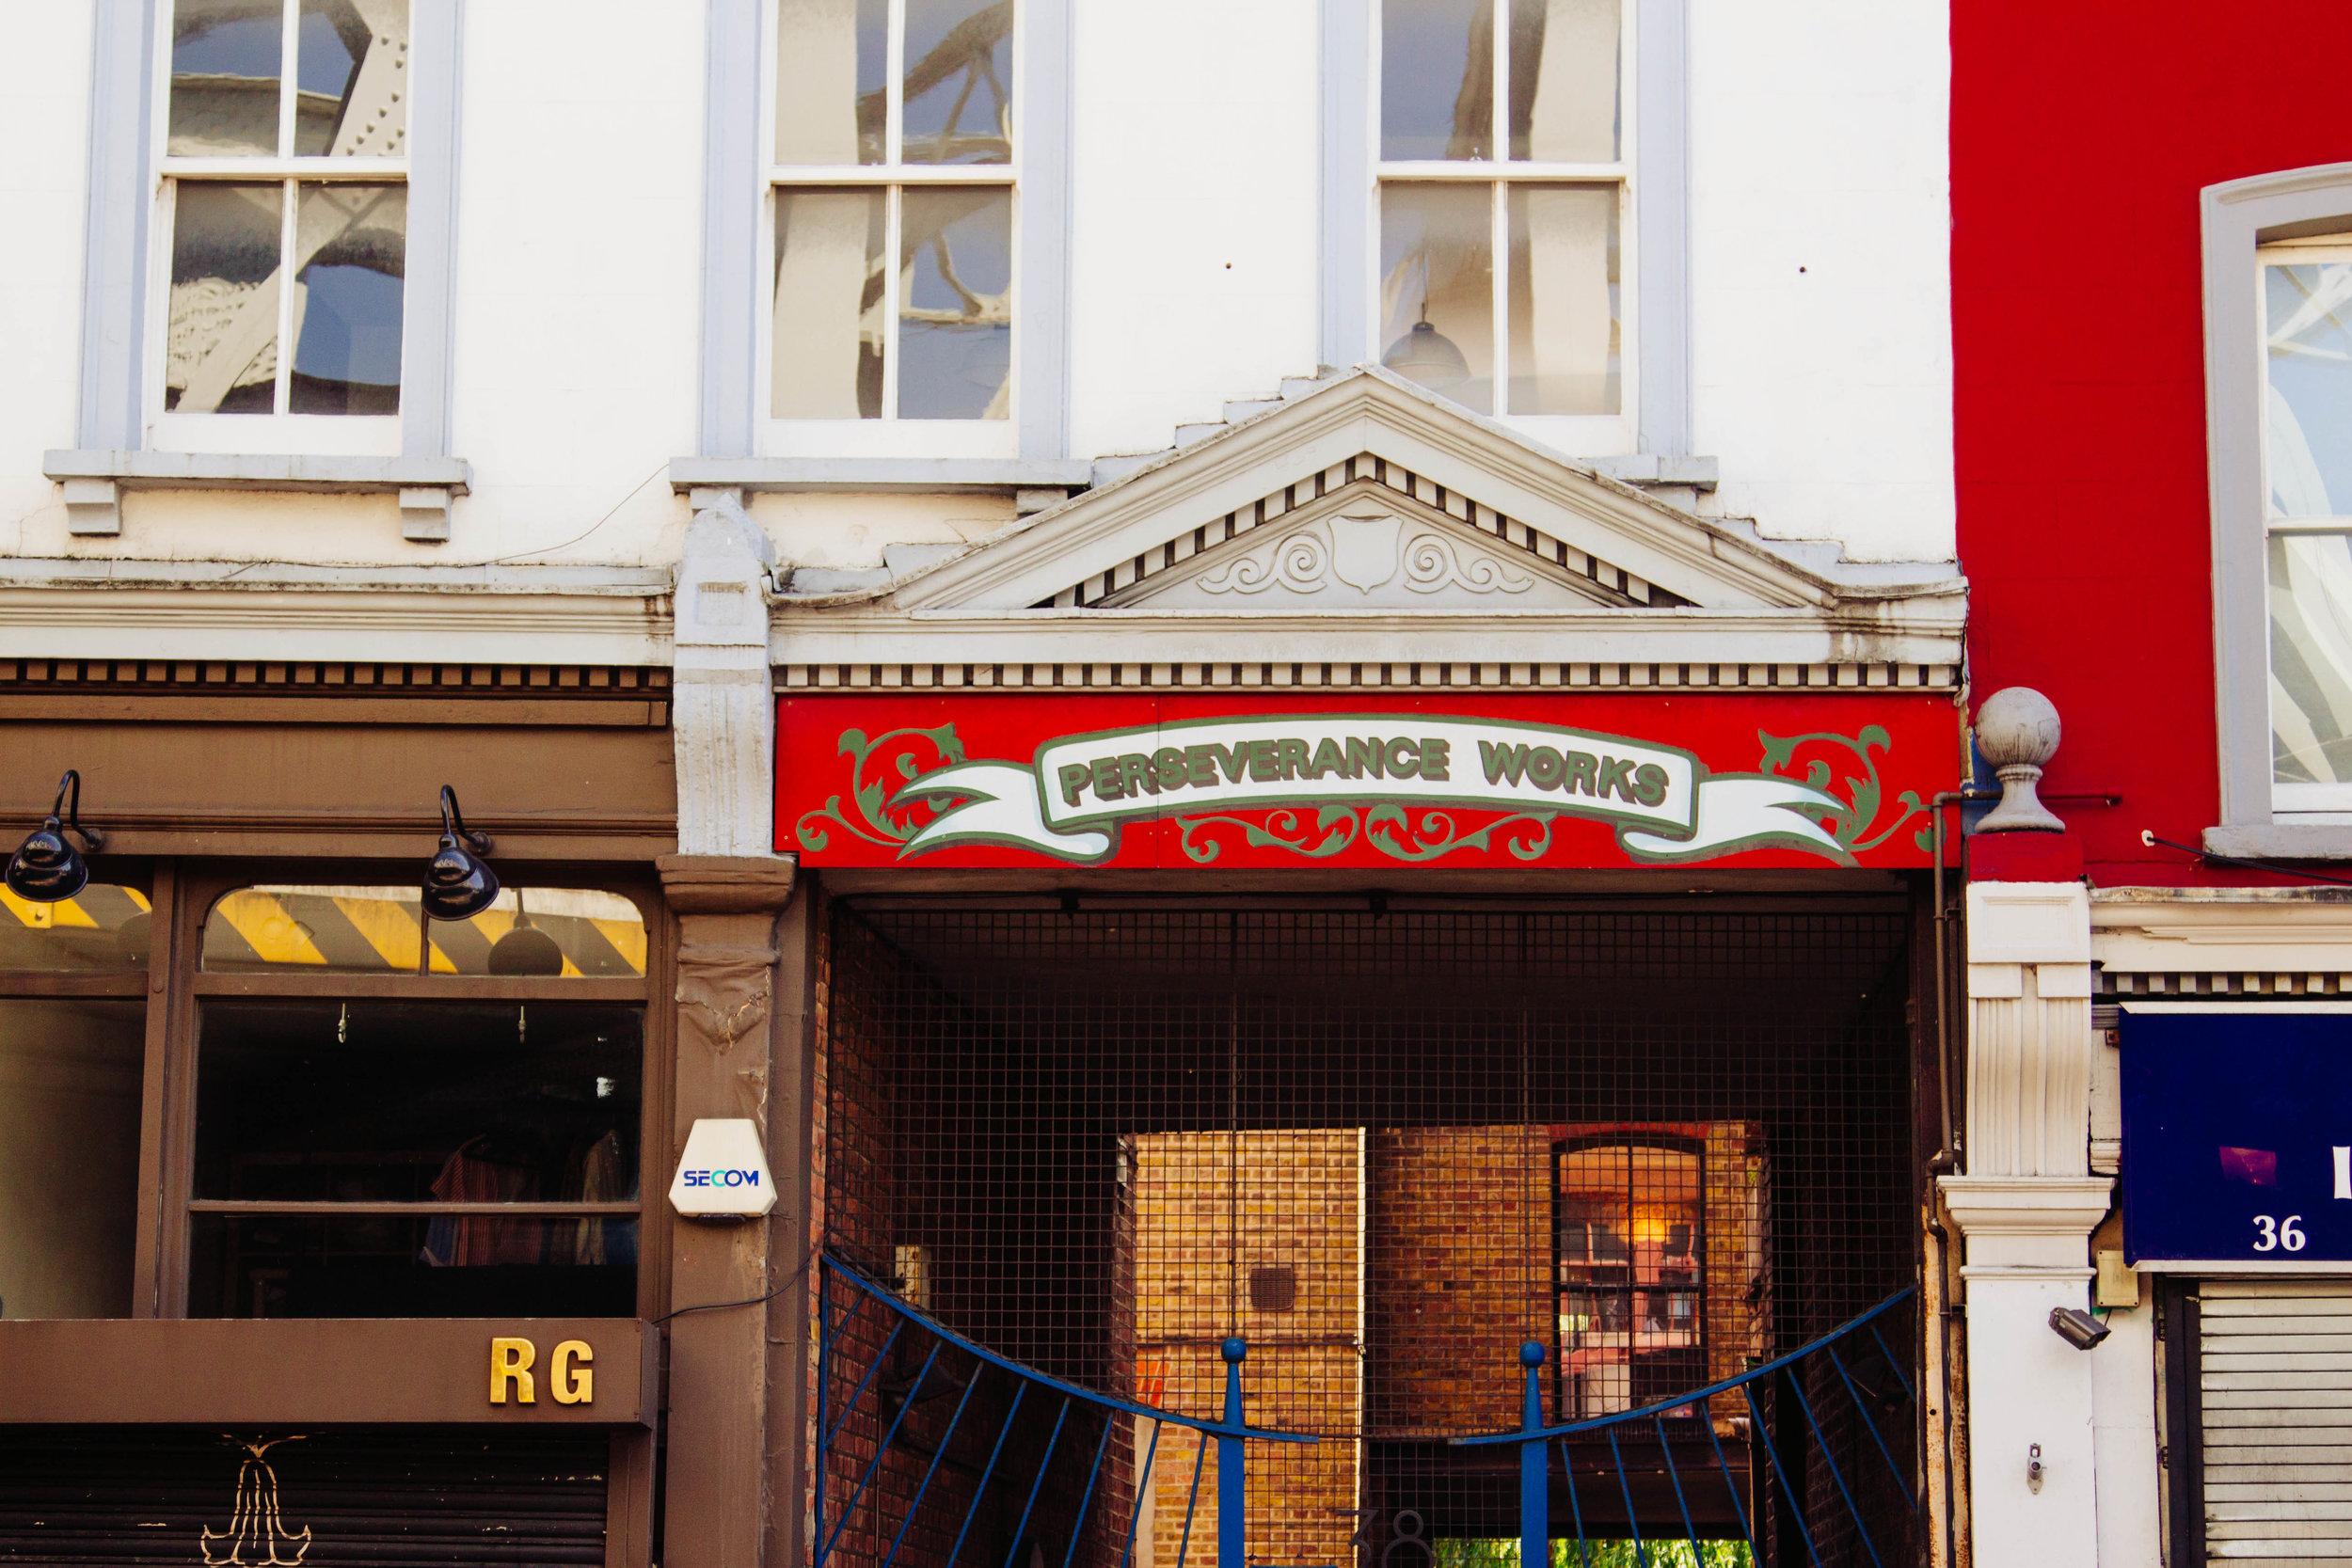 london_27june2019-22.jpg